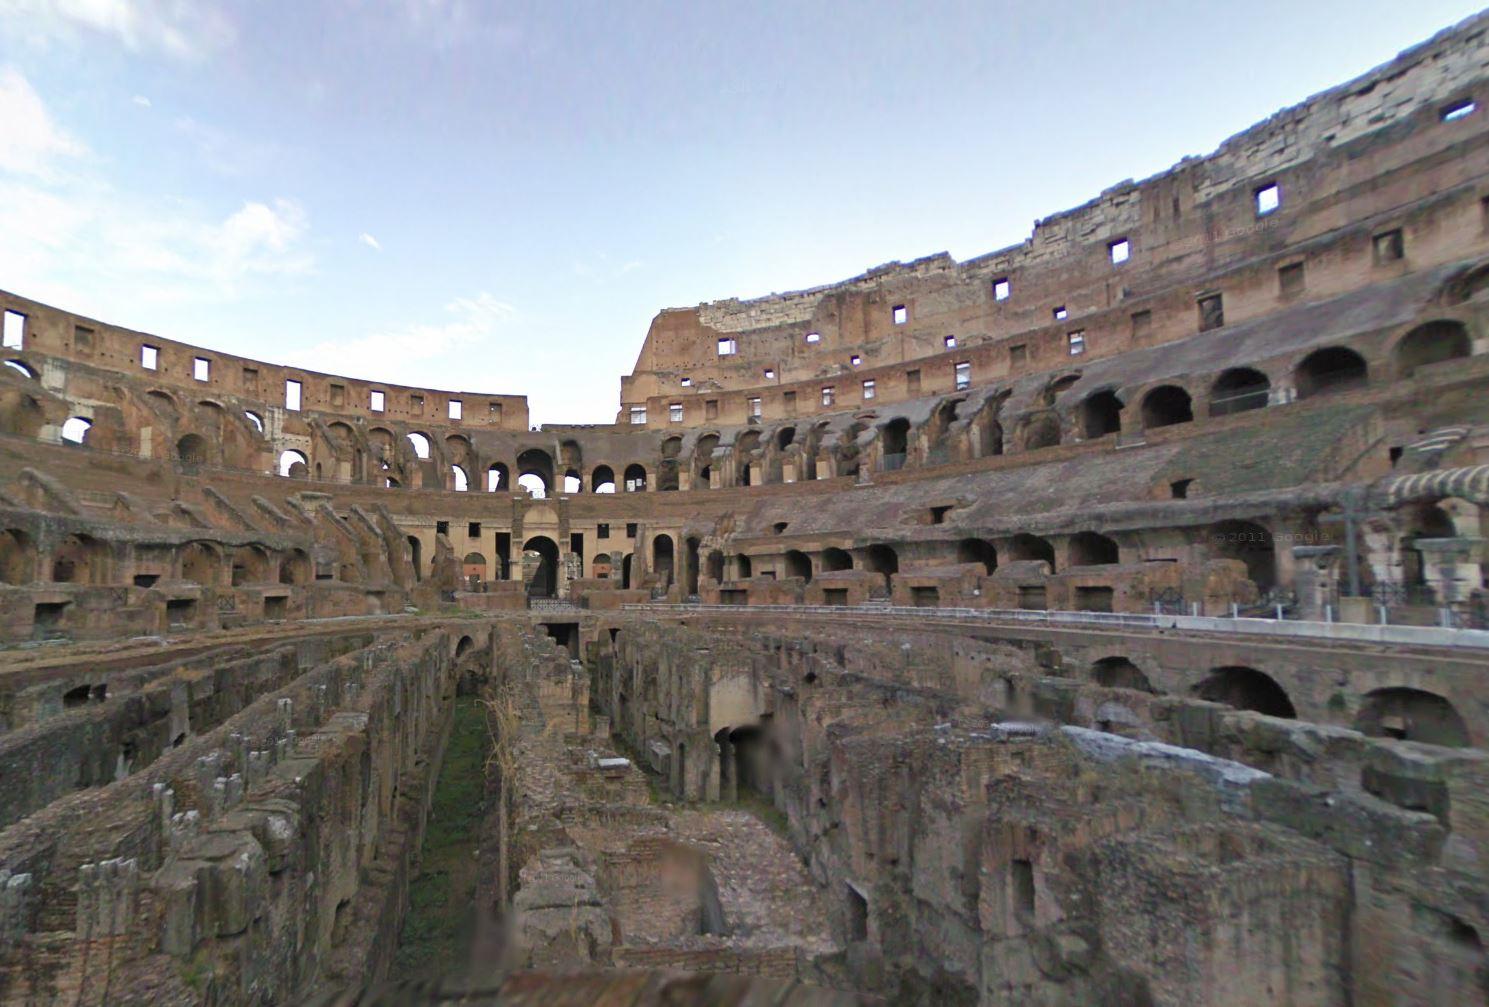 Colosseum Google Street View